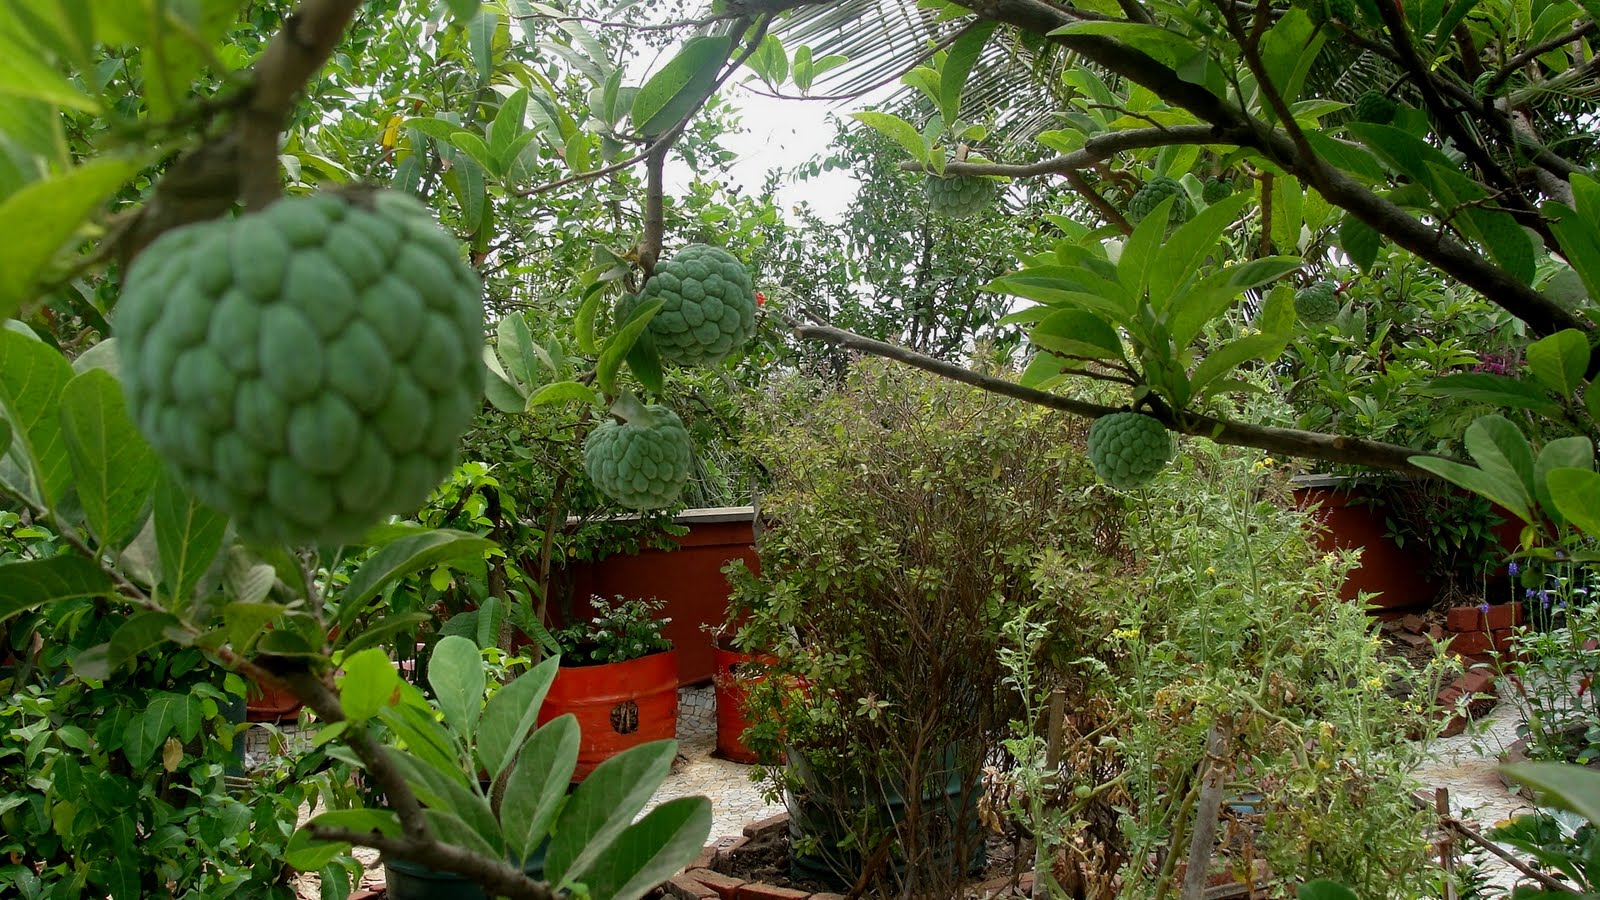 Natueco city farming fruits on terrace for Terrace trees